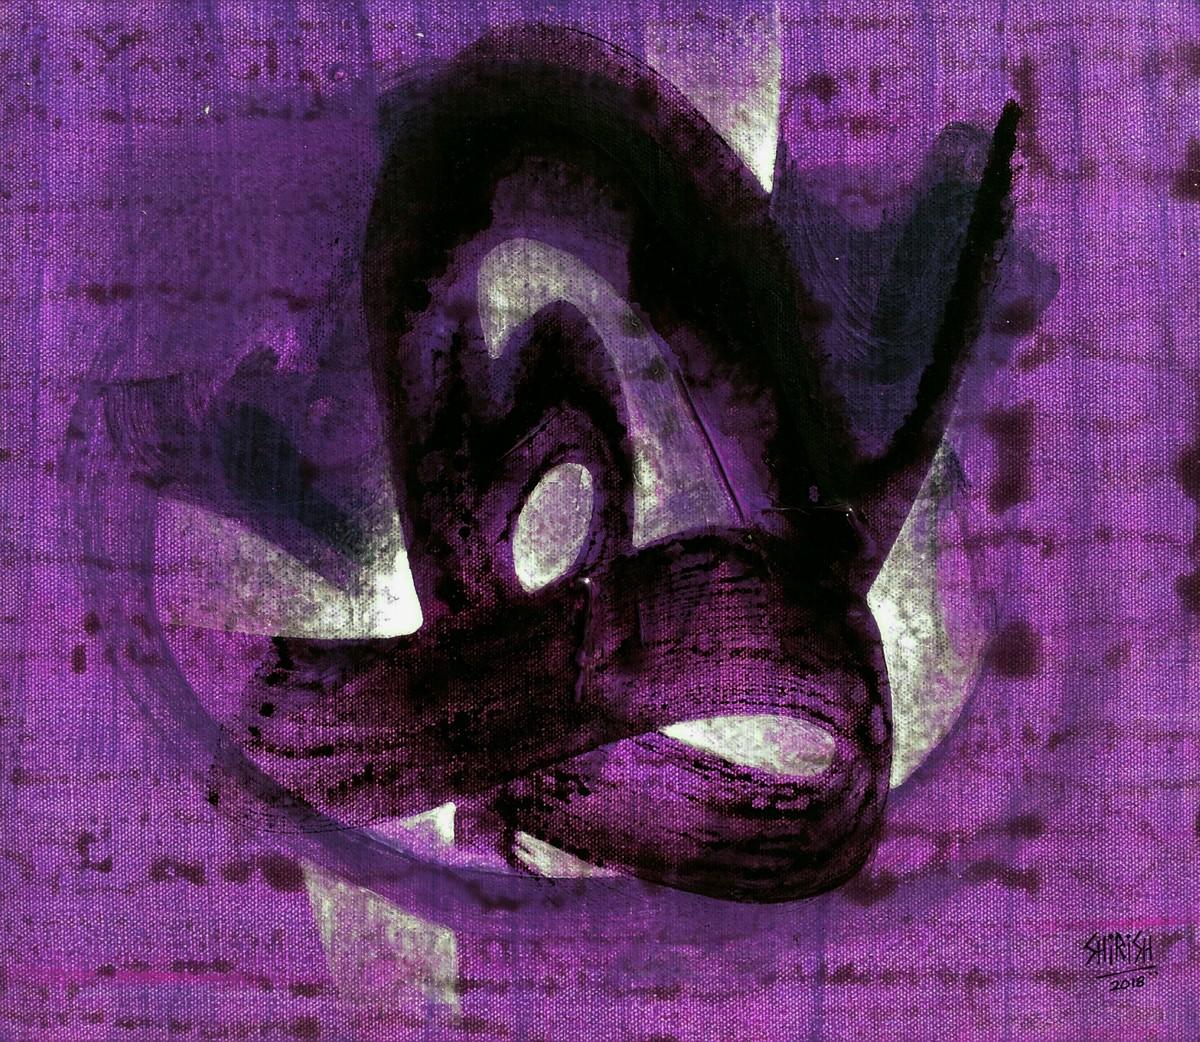 Tandav-02 by Shirish Deshpande, Abstract Painting, Acrylic on Canvas, Purple color